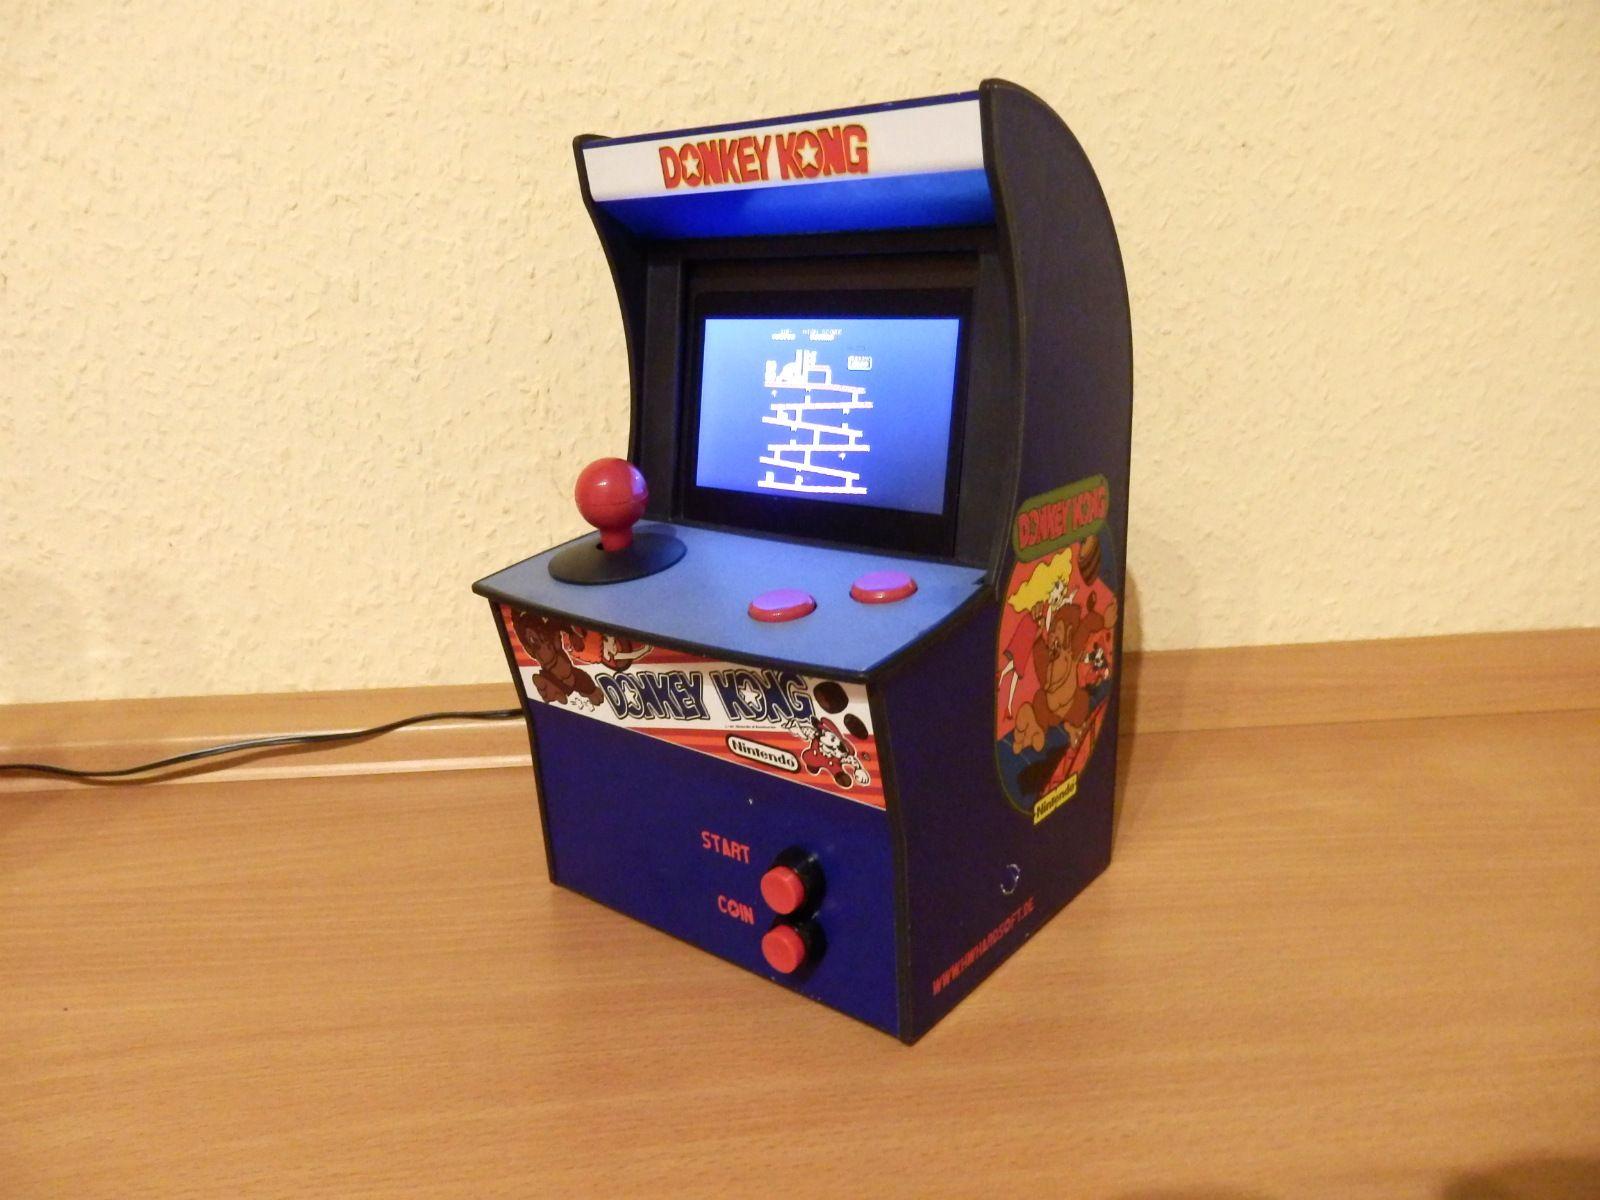 Raspberry Pi Mini Arcade With 4 3 Inch Tft And Donkey Kong